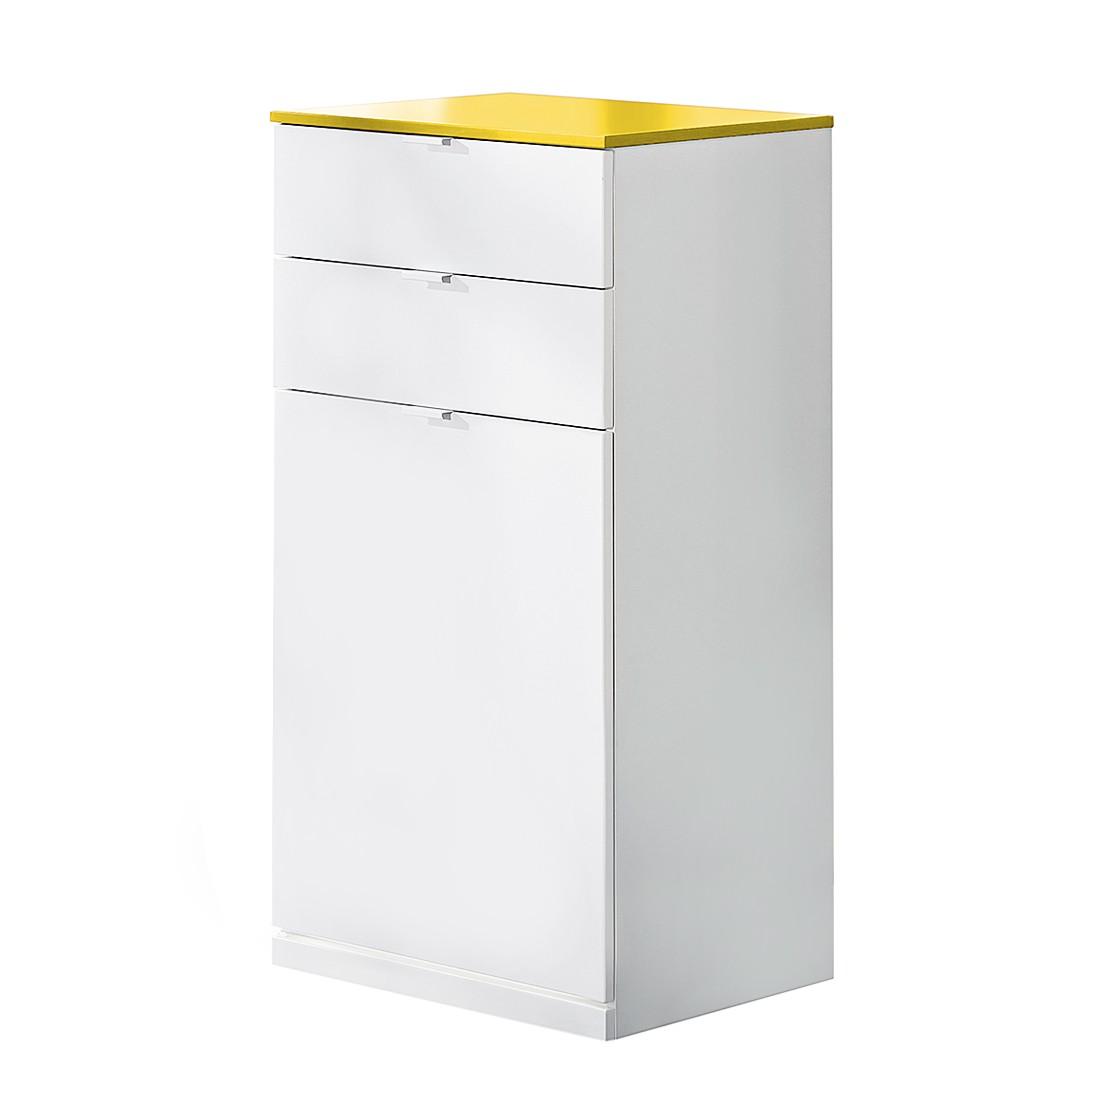 Schuhkommode Vip II - Weiß/Gelb